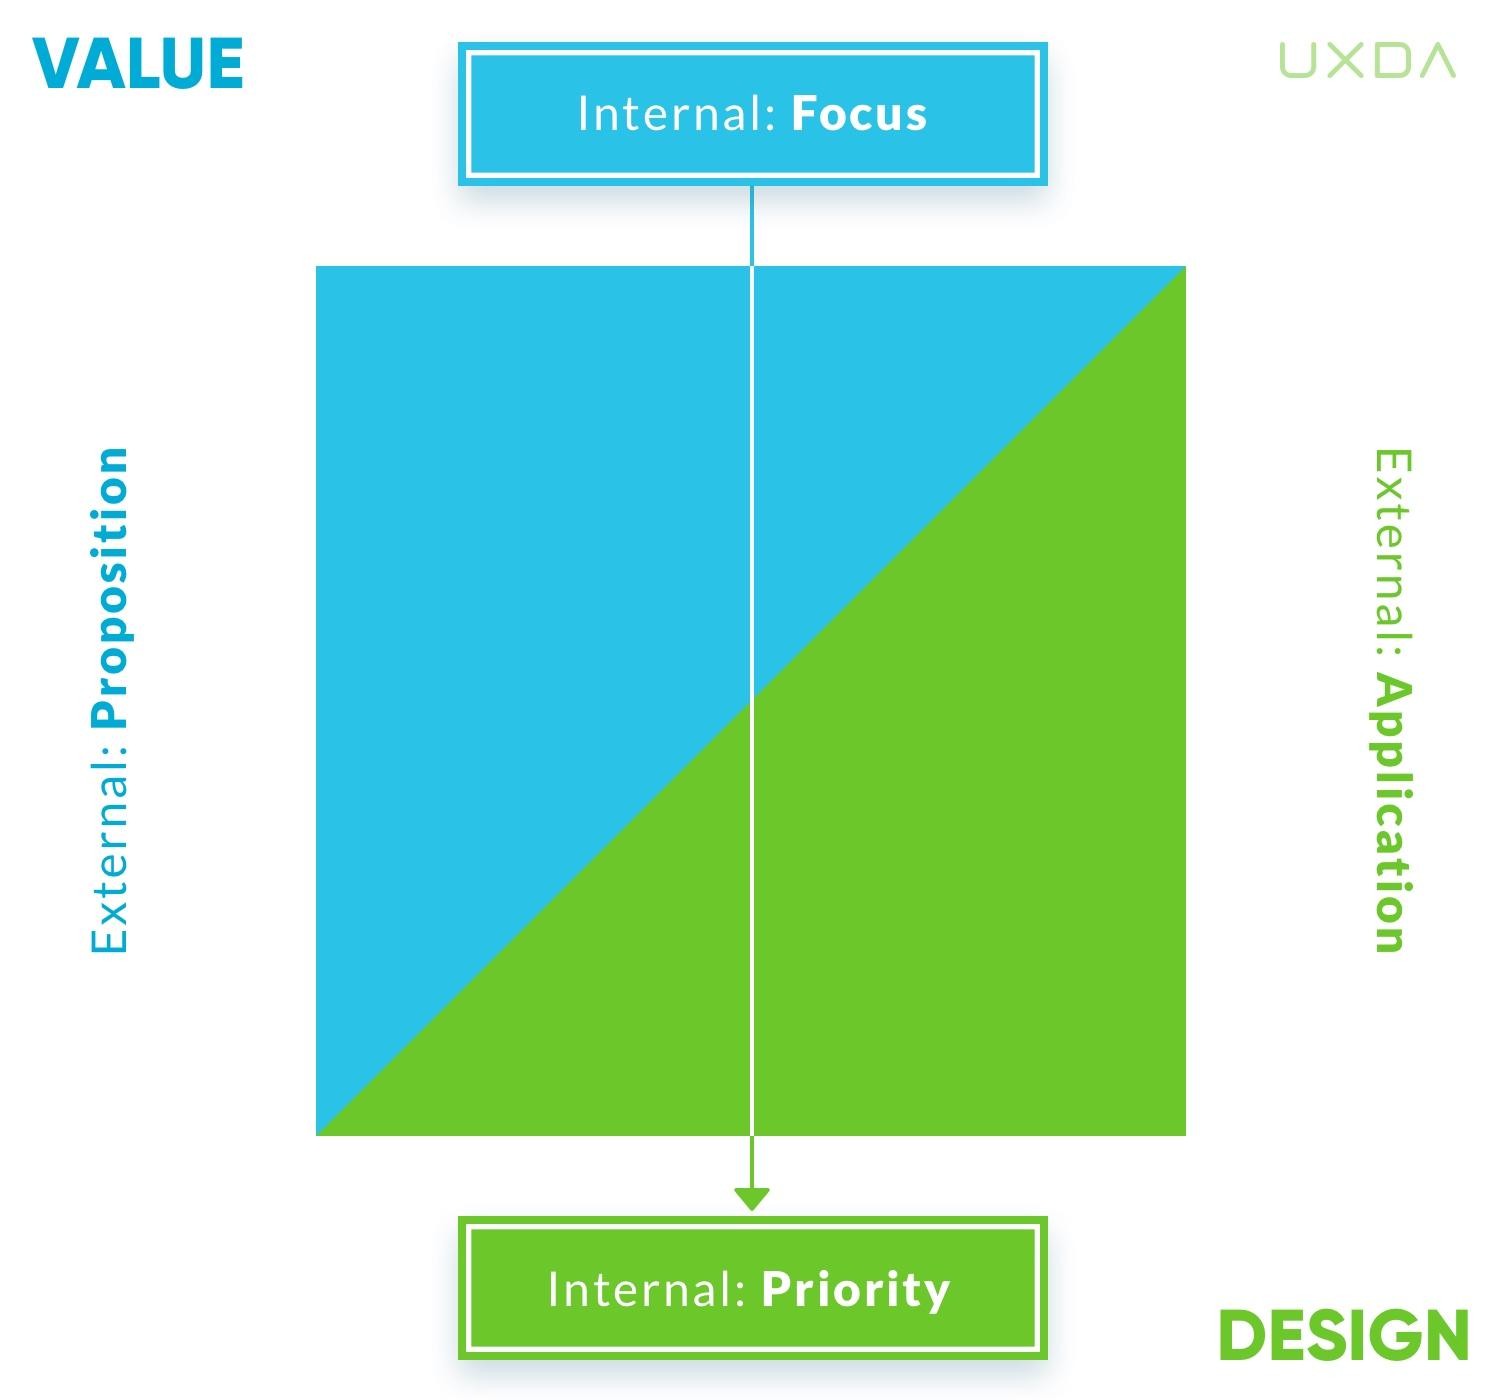 financial-design-matrix-for-banking-disruption-04.jpg